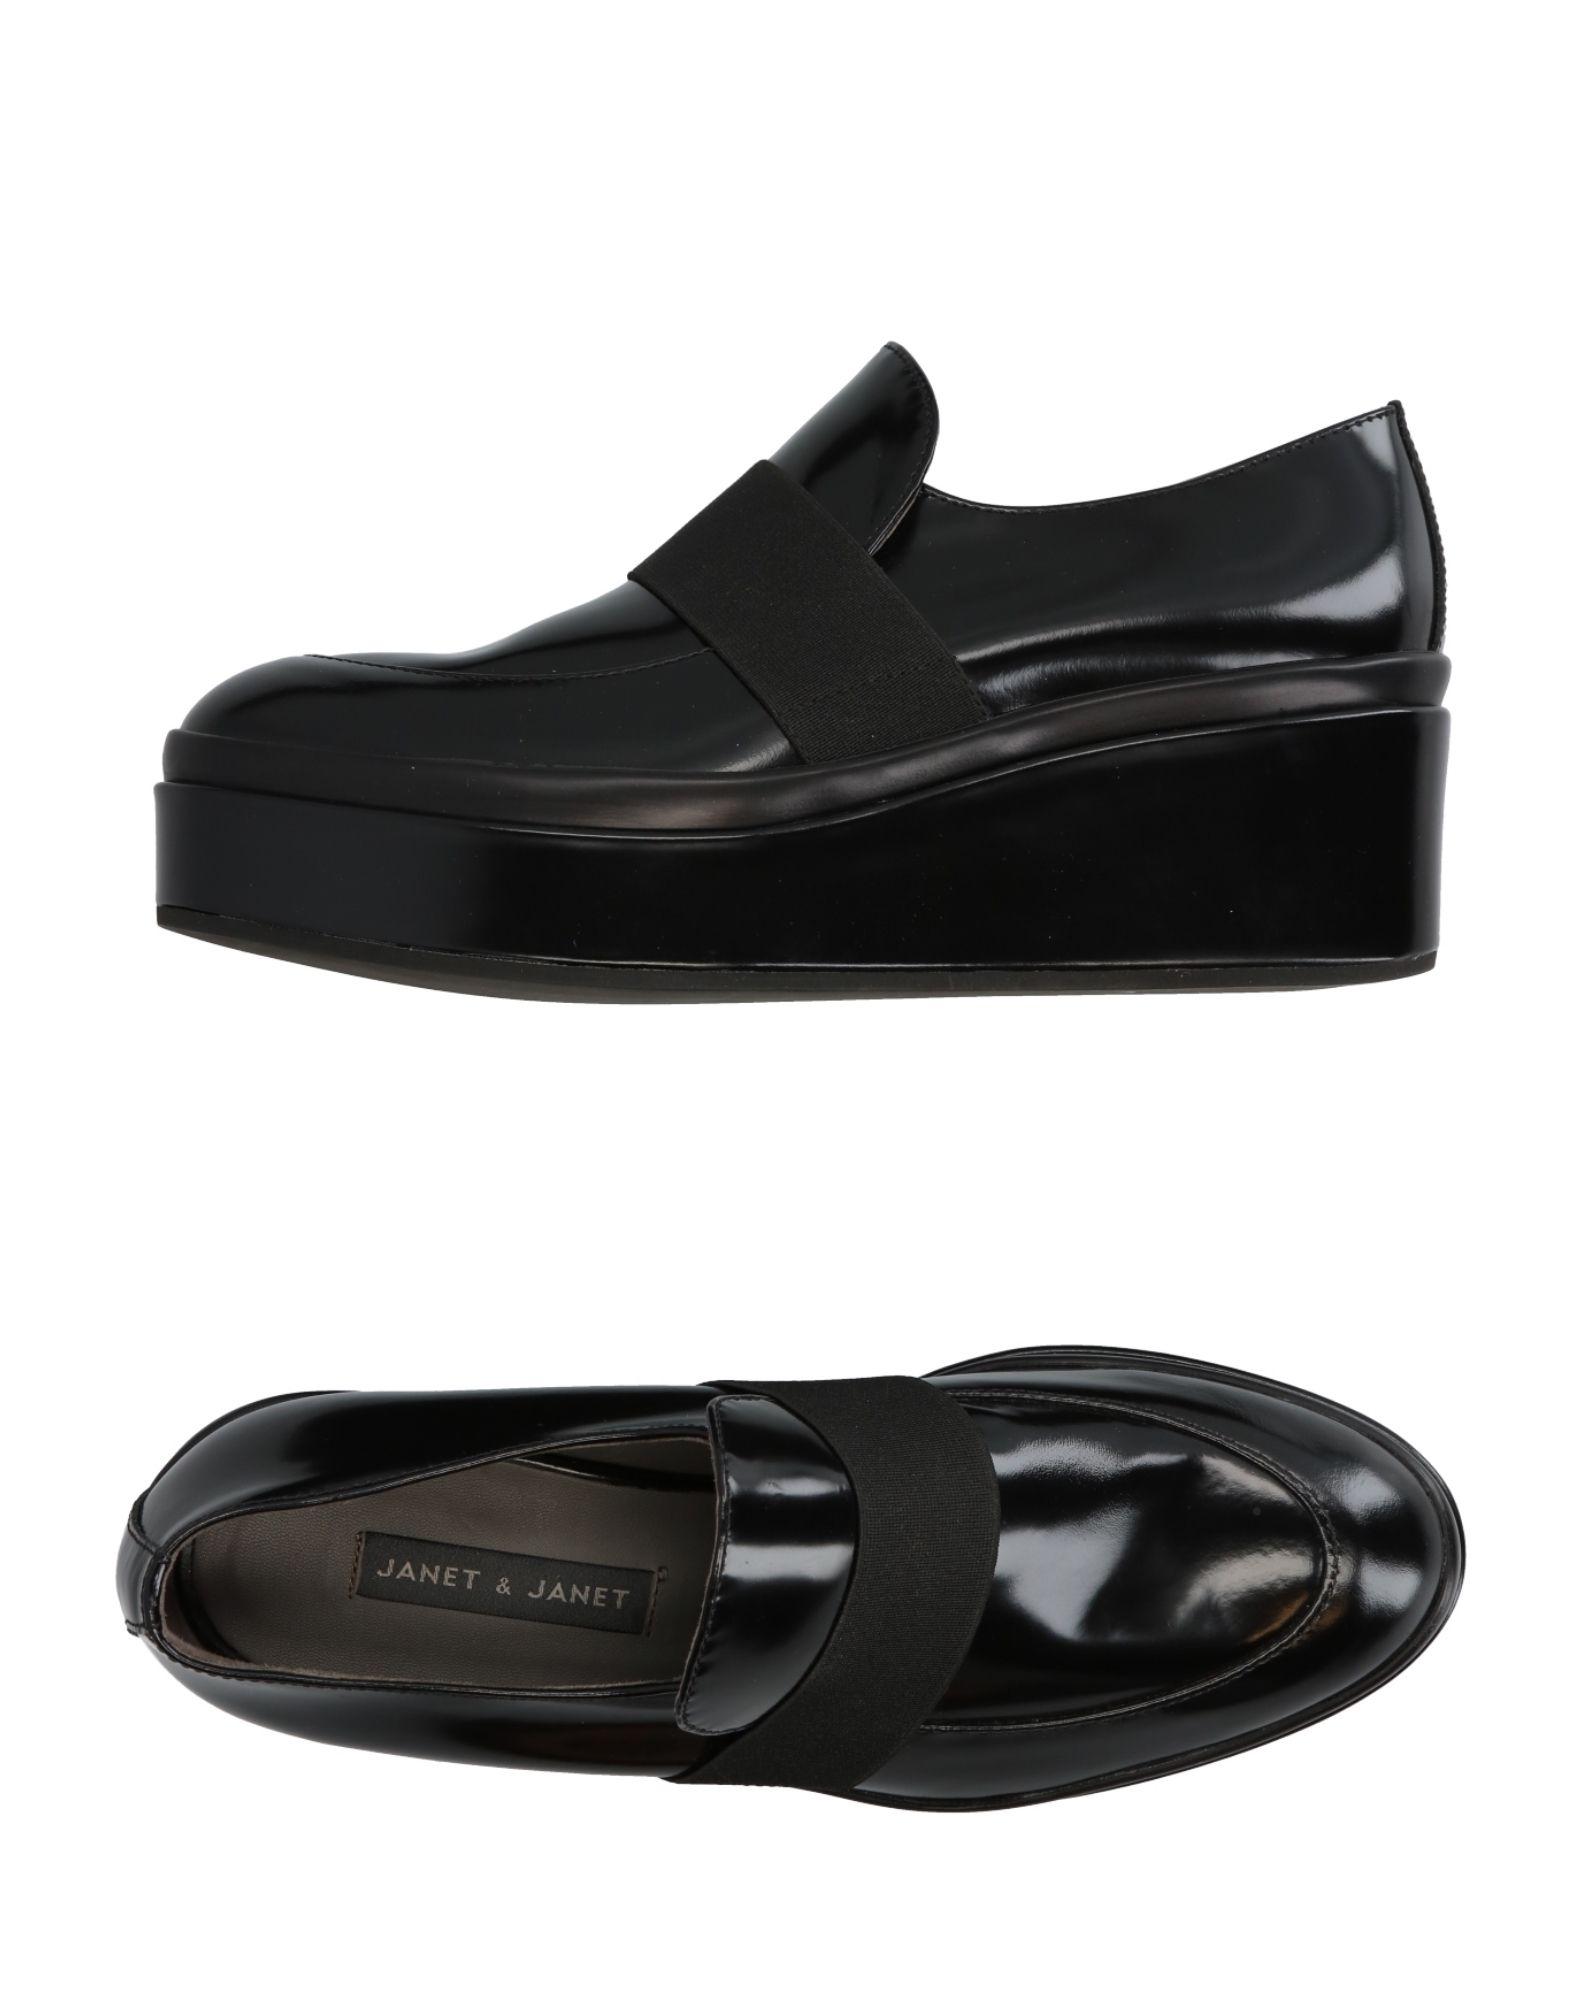 Stilvolle billige Schuhe Janet & Janet Mokassins Damen  11297312OJ